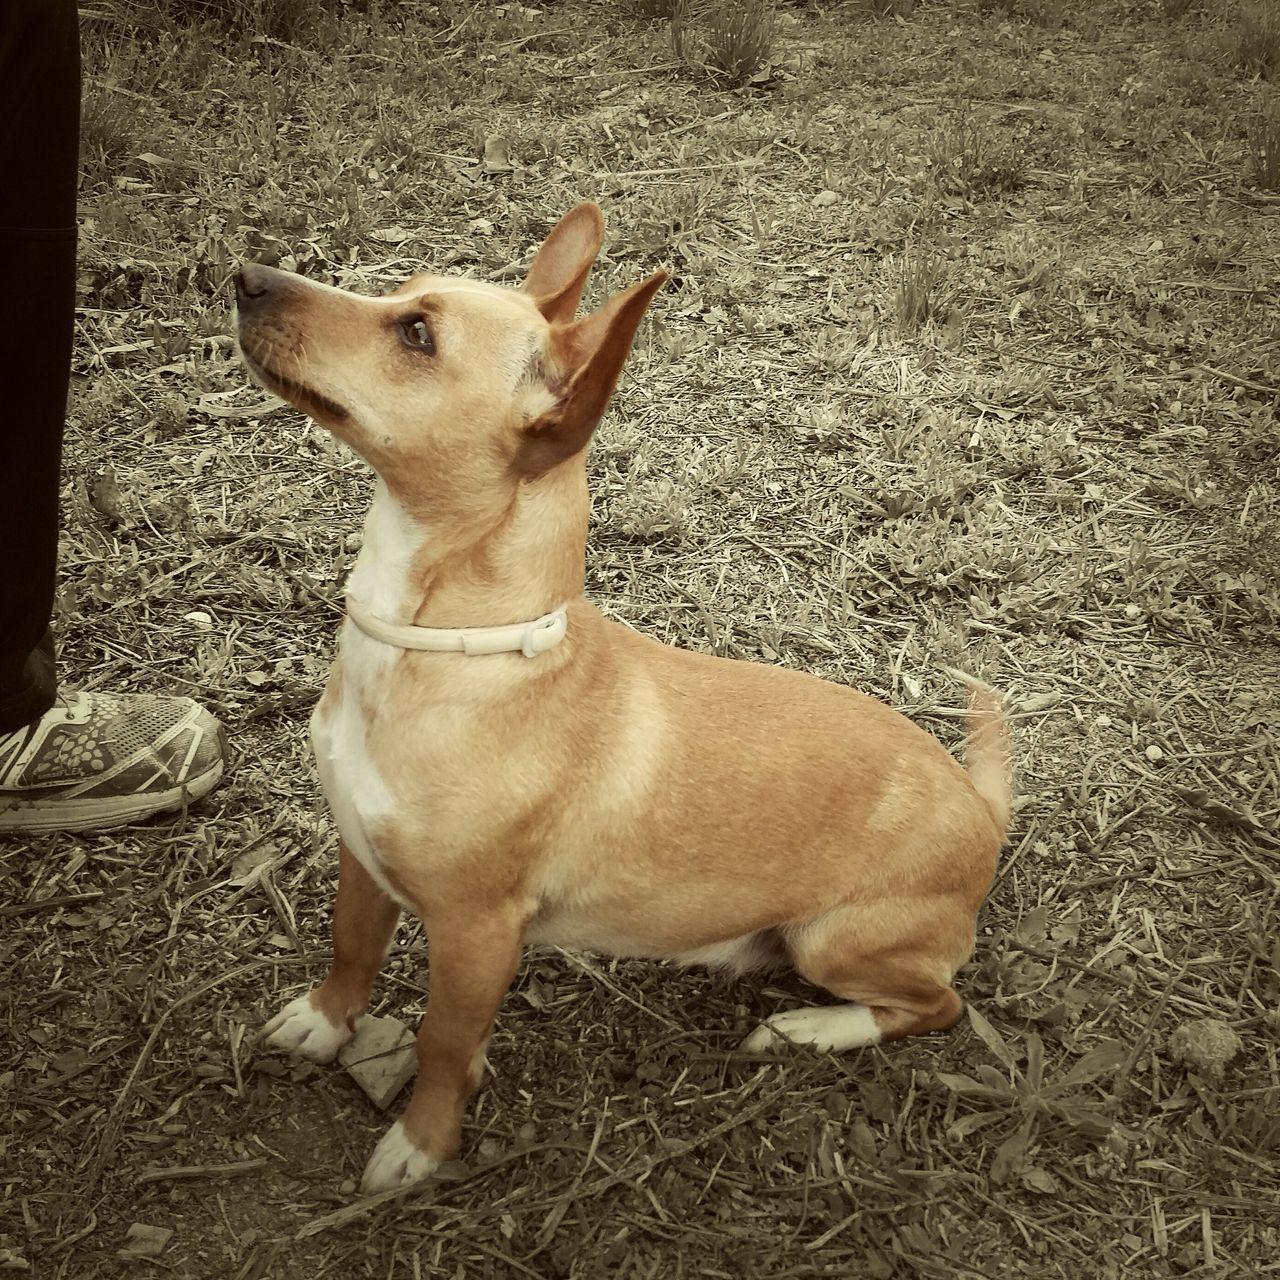 Dogs EyeEm Best Shots Streamzoofamily Art Is Portable With Caseable Mi Pollo Y Yo La Mancha Foto España